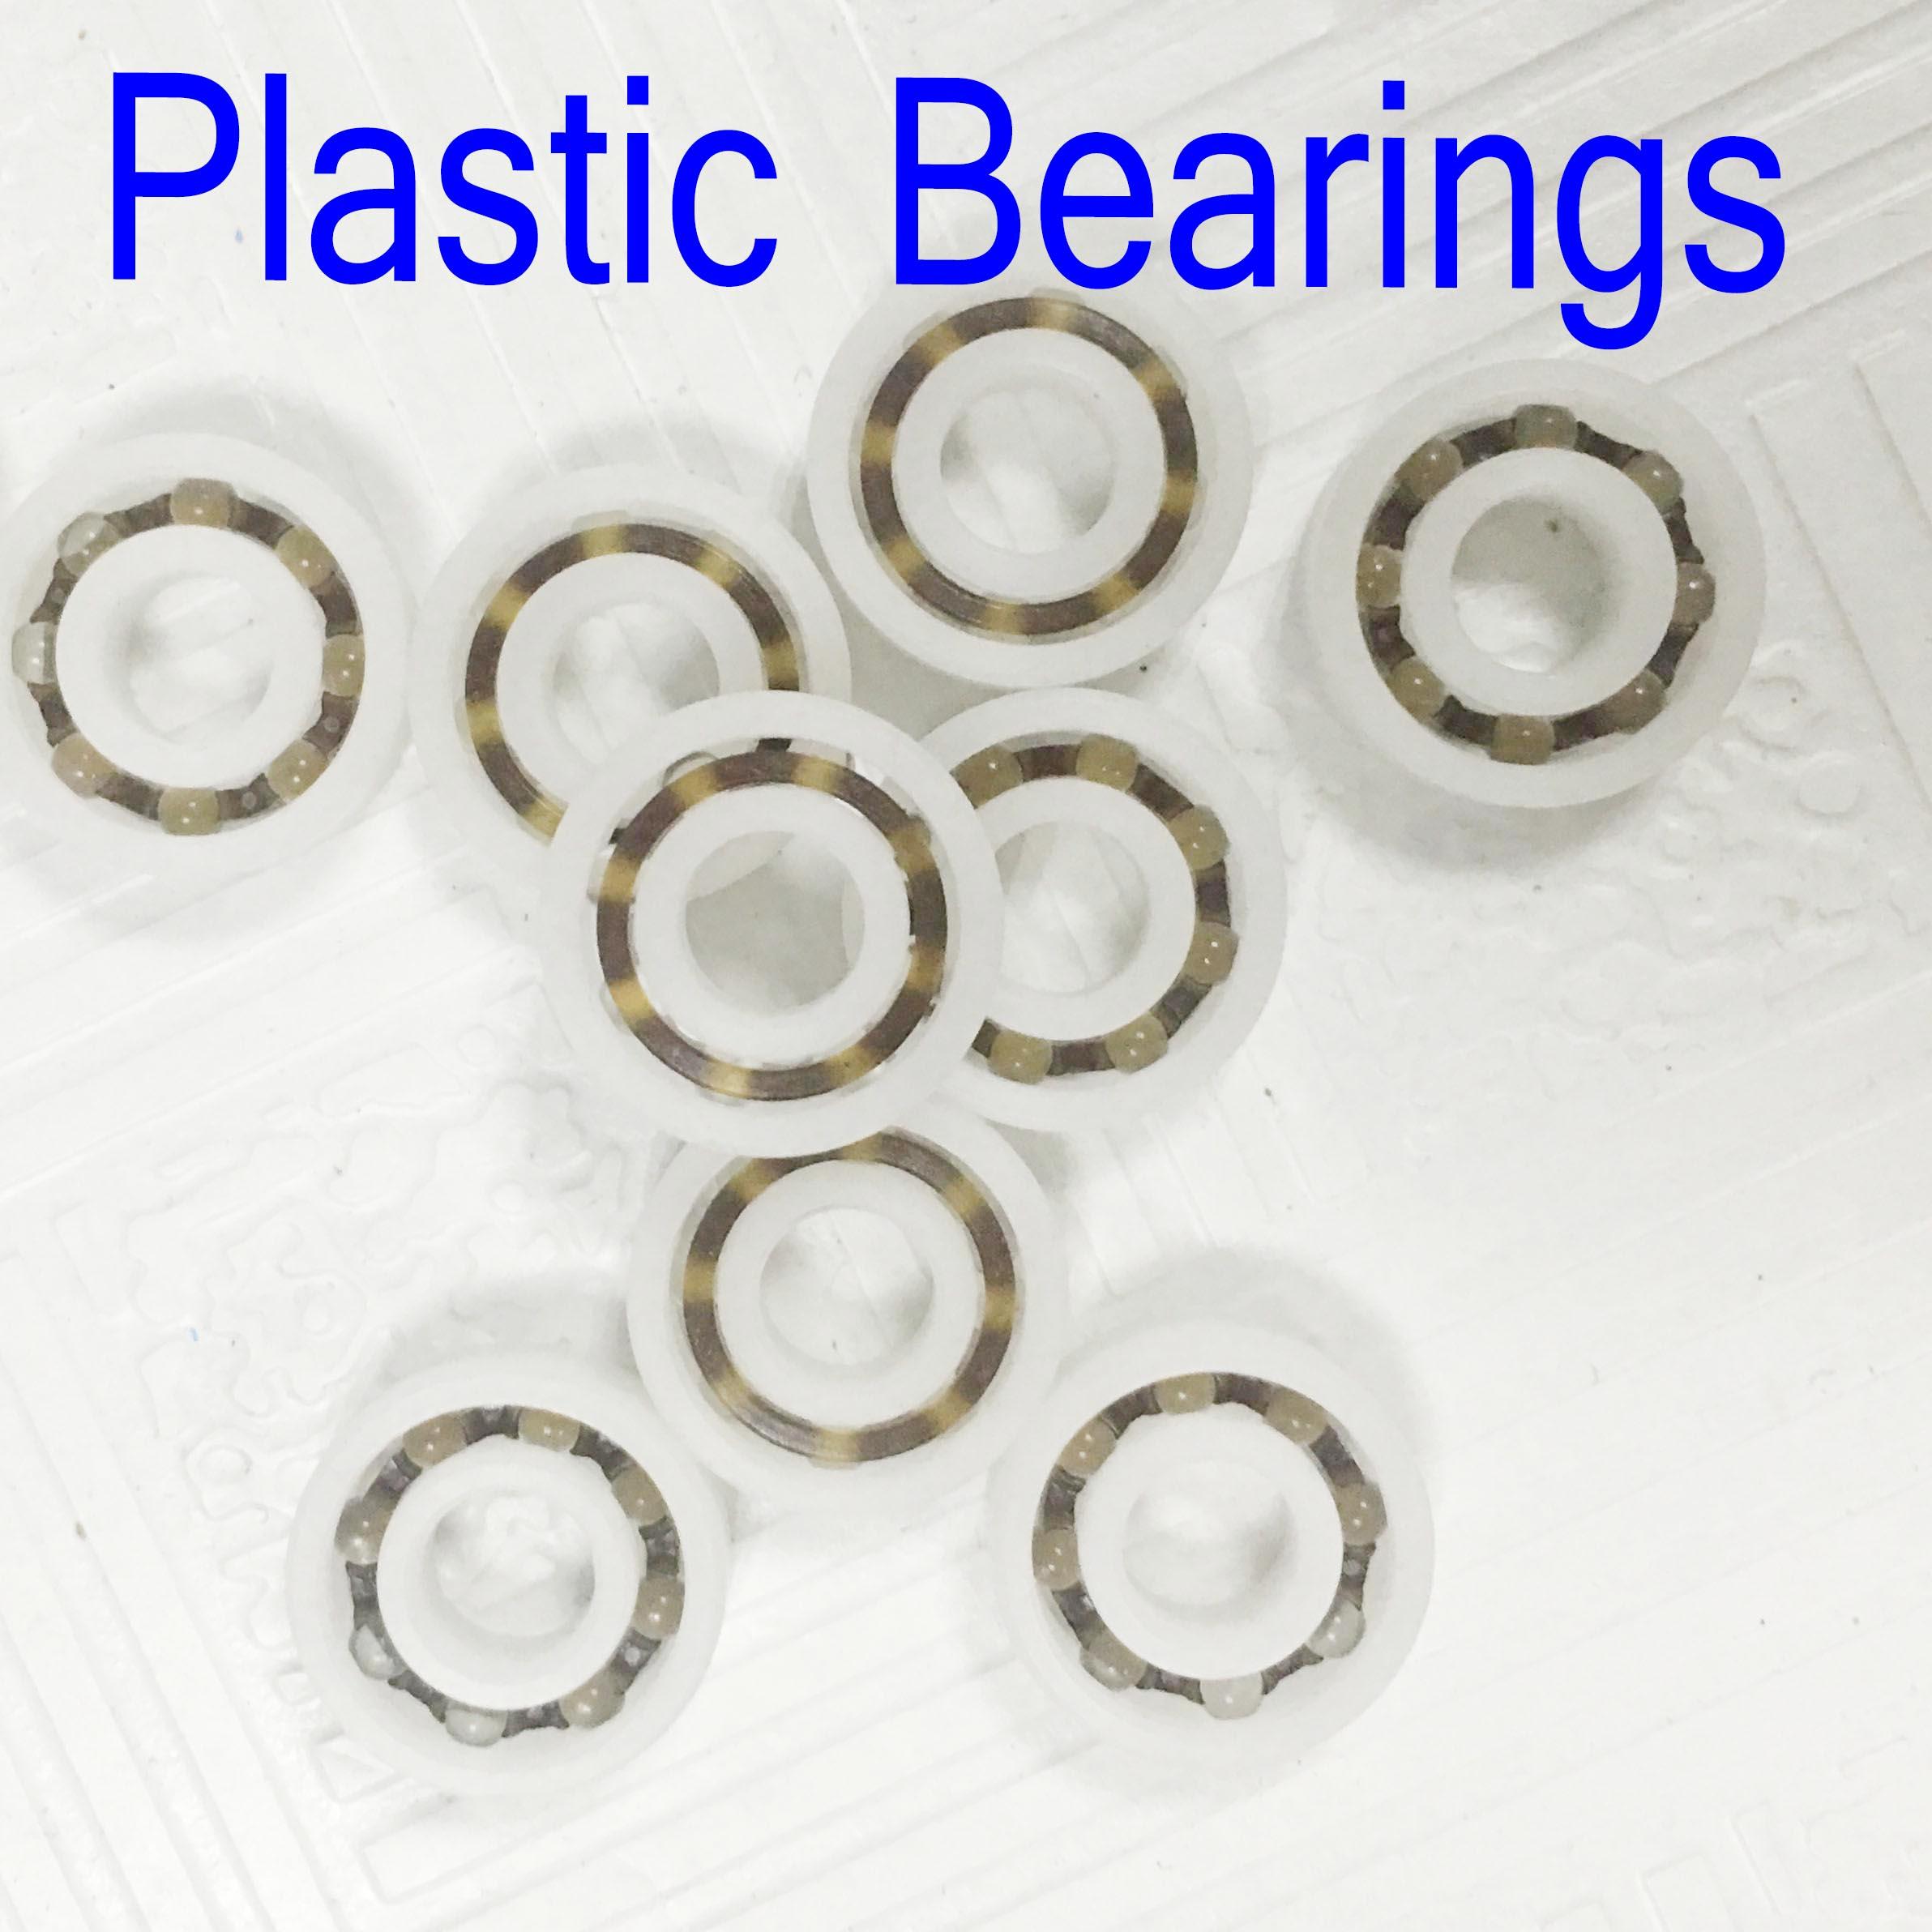 6010 POM (10PCS)  Plastic bearings 50x80x16mm Glass Balls 50mm/80mm/16mm 6310 pom 10pcs plastic ball bearings 50x110x27mm glass balls 50mm 110mm 27mm